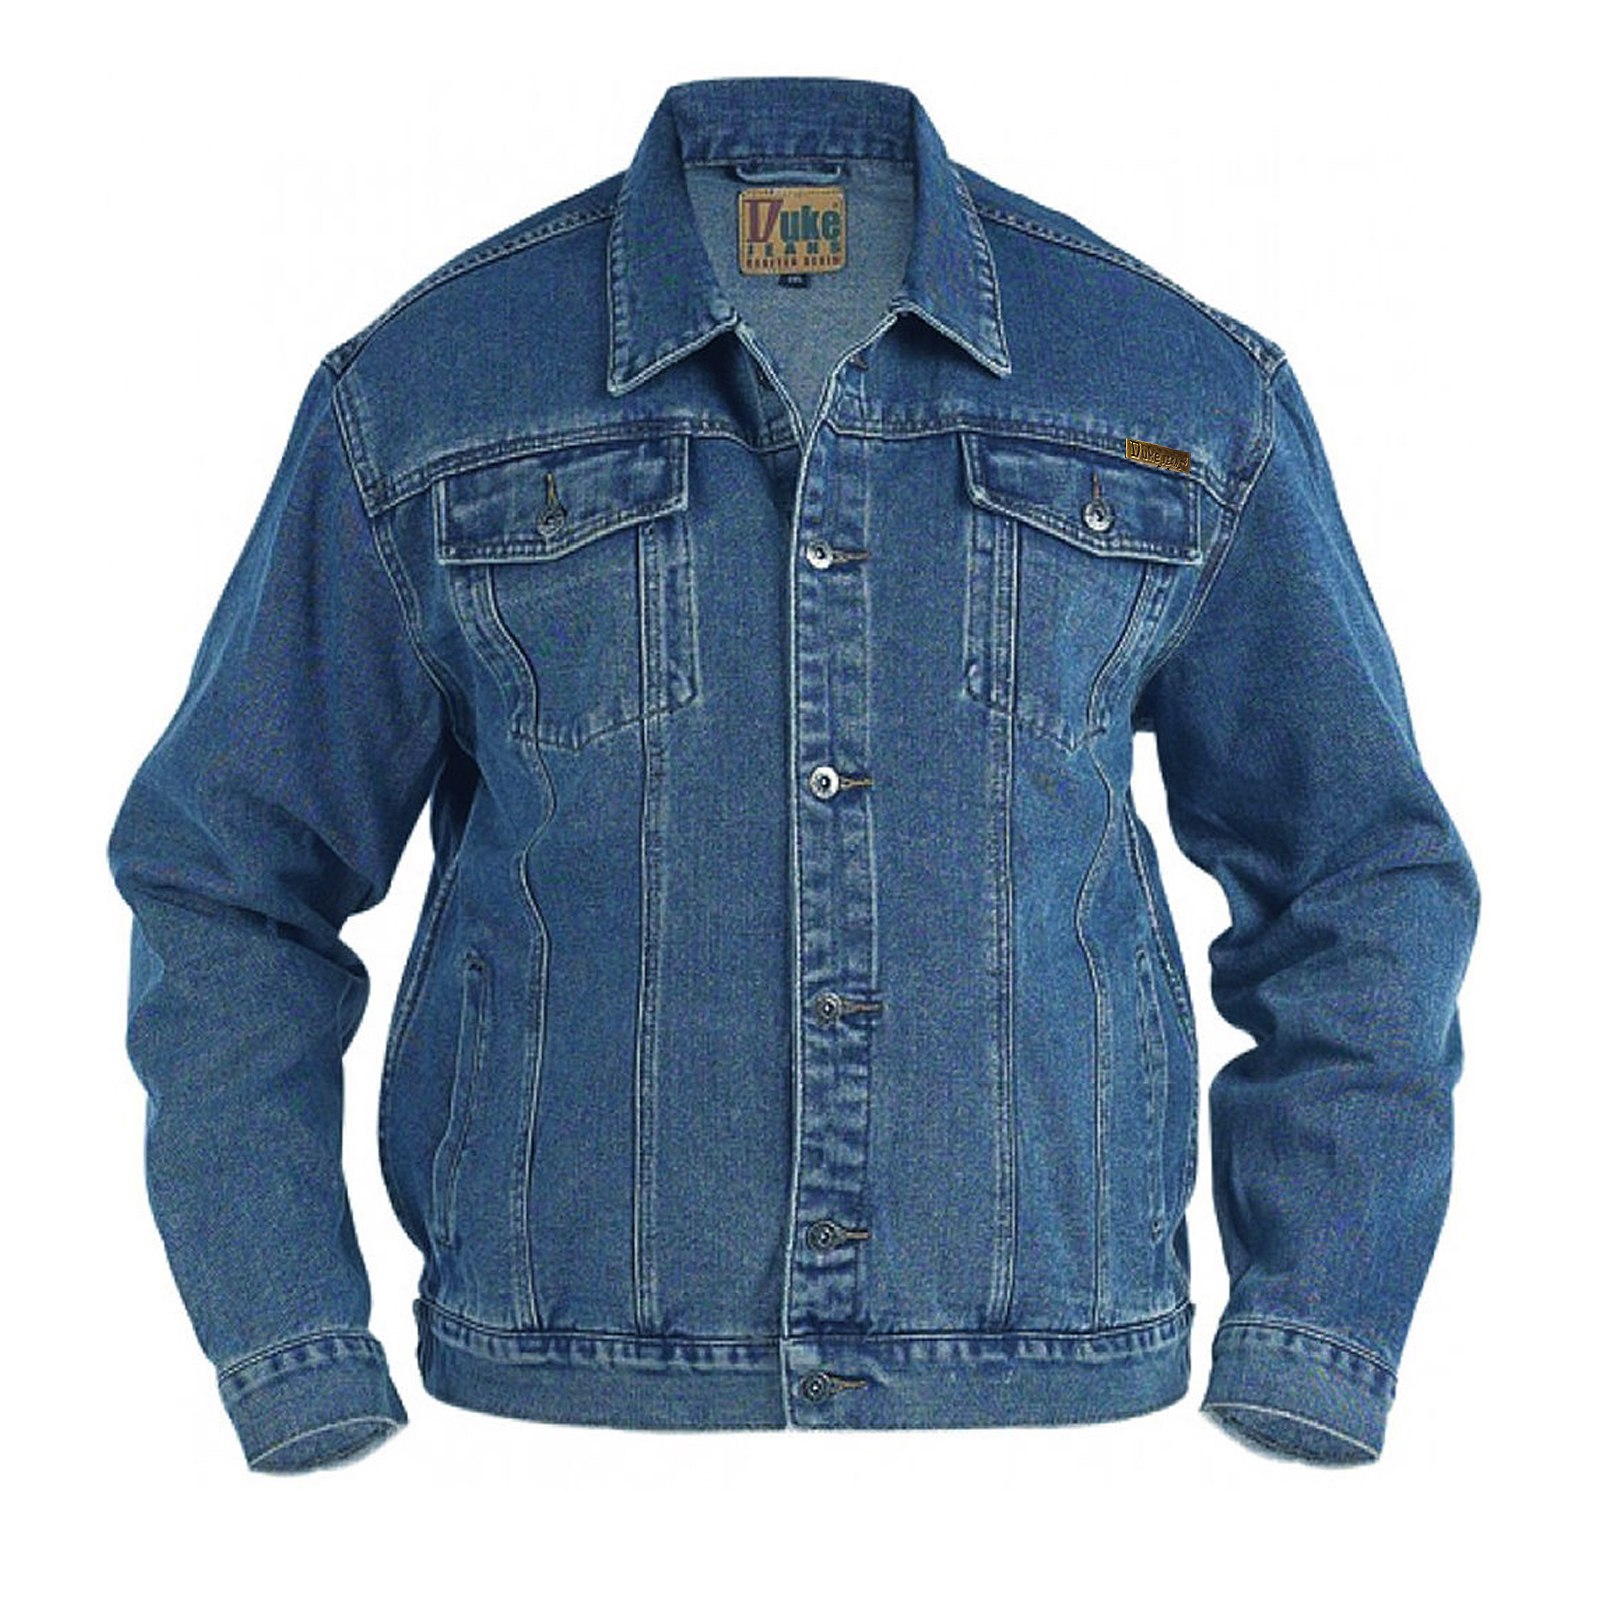 Duke D555 Mens Trucker Designer Big Tall King Size Denim Jeans Stone Wash Jacket